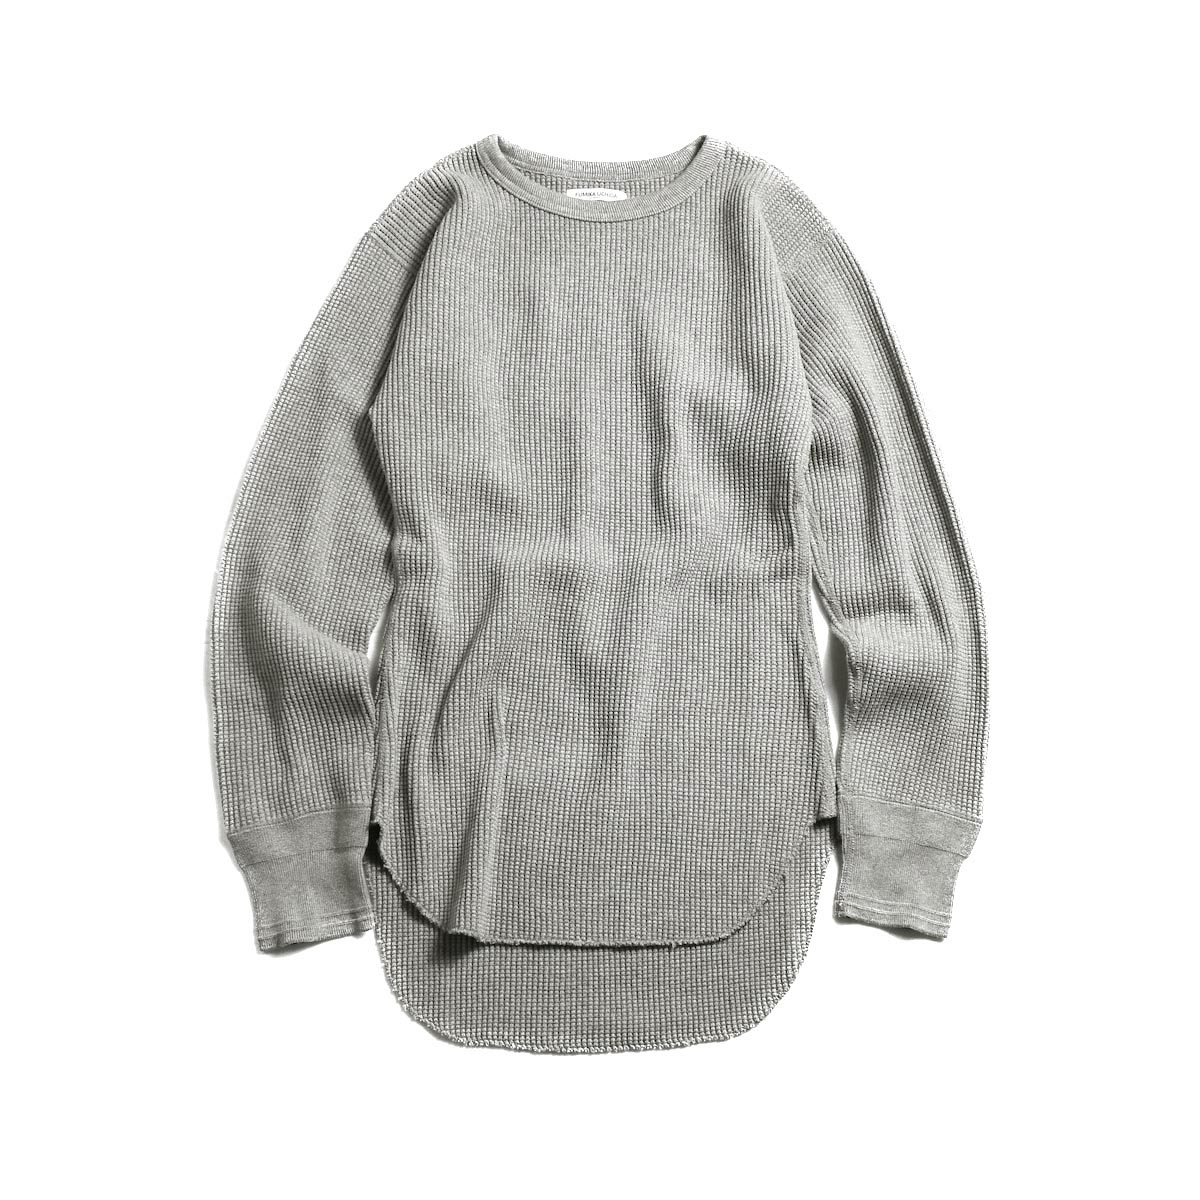 FUMIKA UCHIDA / Cotton Waffle Thermal Top -Grey